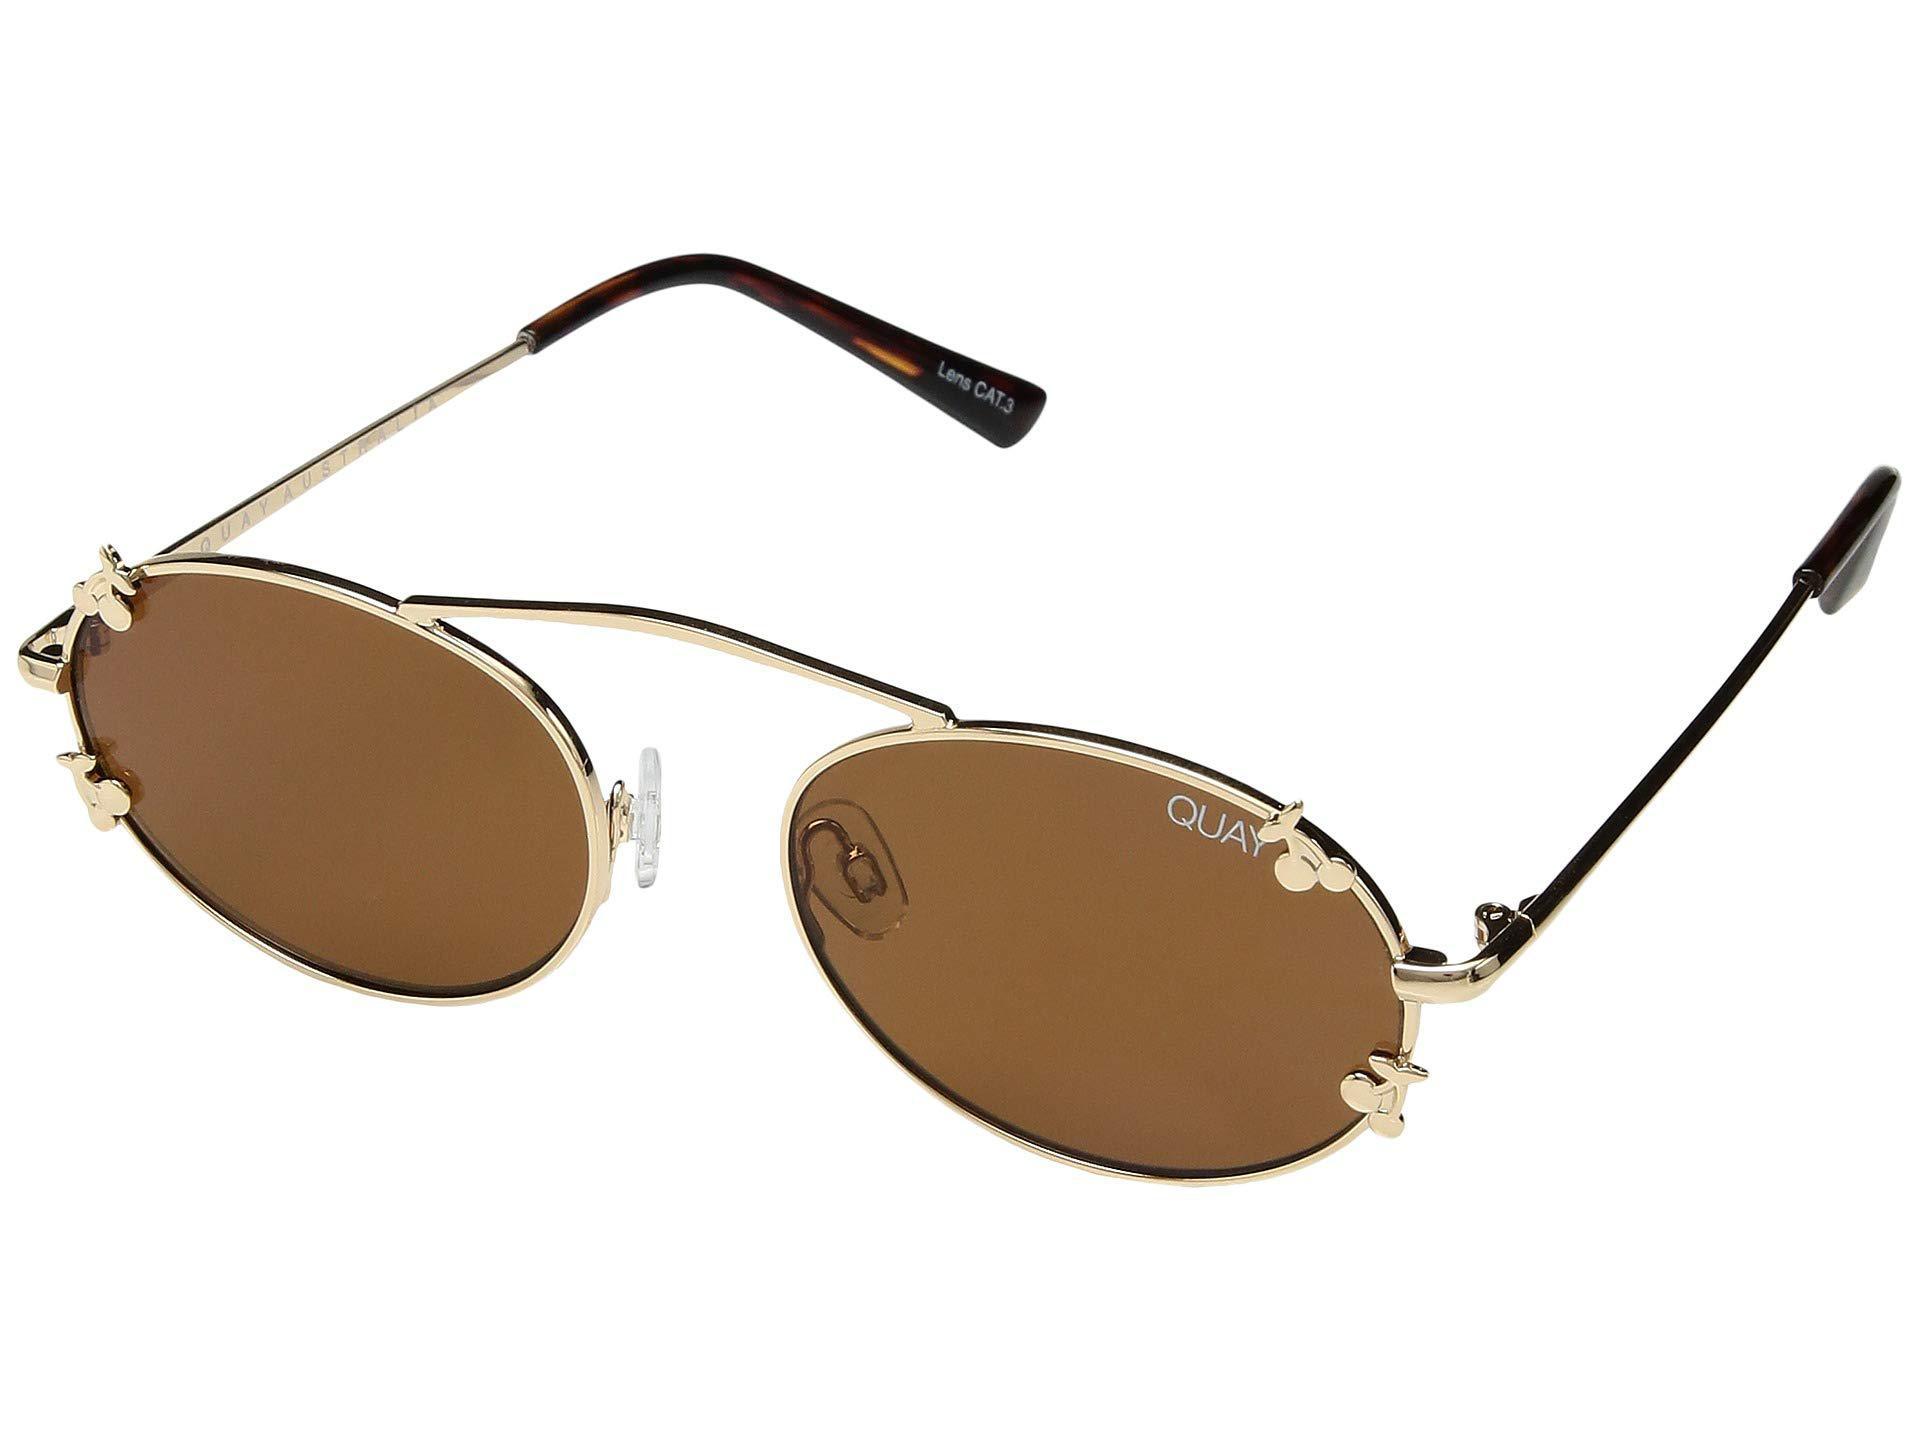 785eaa8e32faa Lyst - Quay Final Stand Cherries (gold brown) Fashion Sunglasses in ...